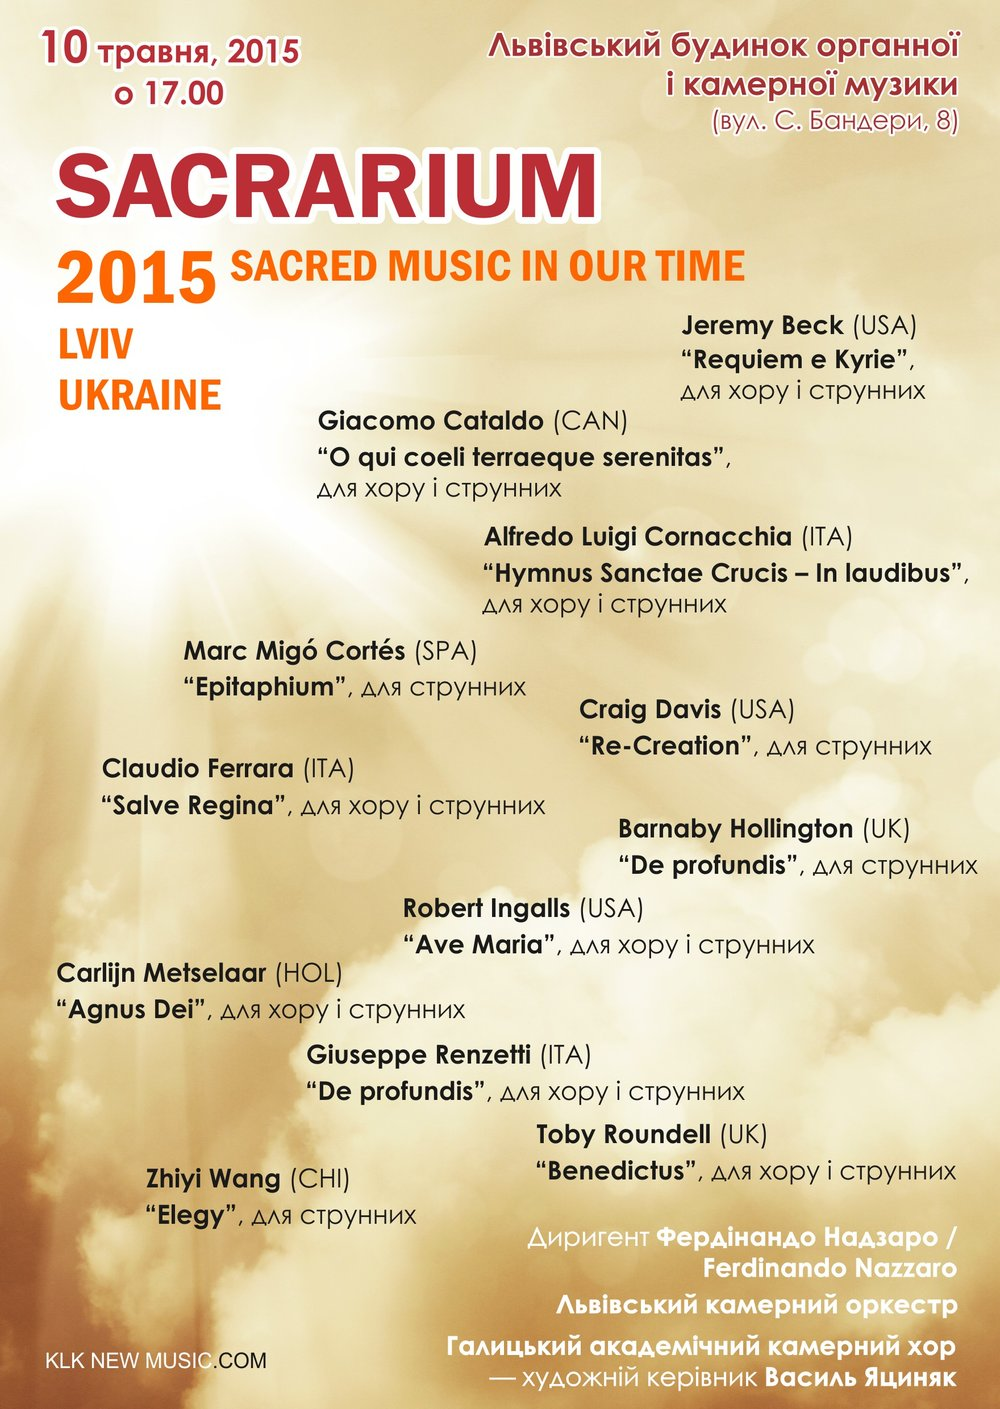 Craig Michael Davis_Orchestral Advert_Sacrarium 2015 (L'viv, Ukraine) Poster.jpg